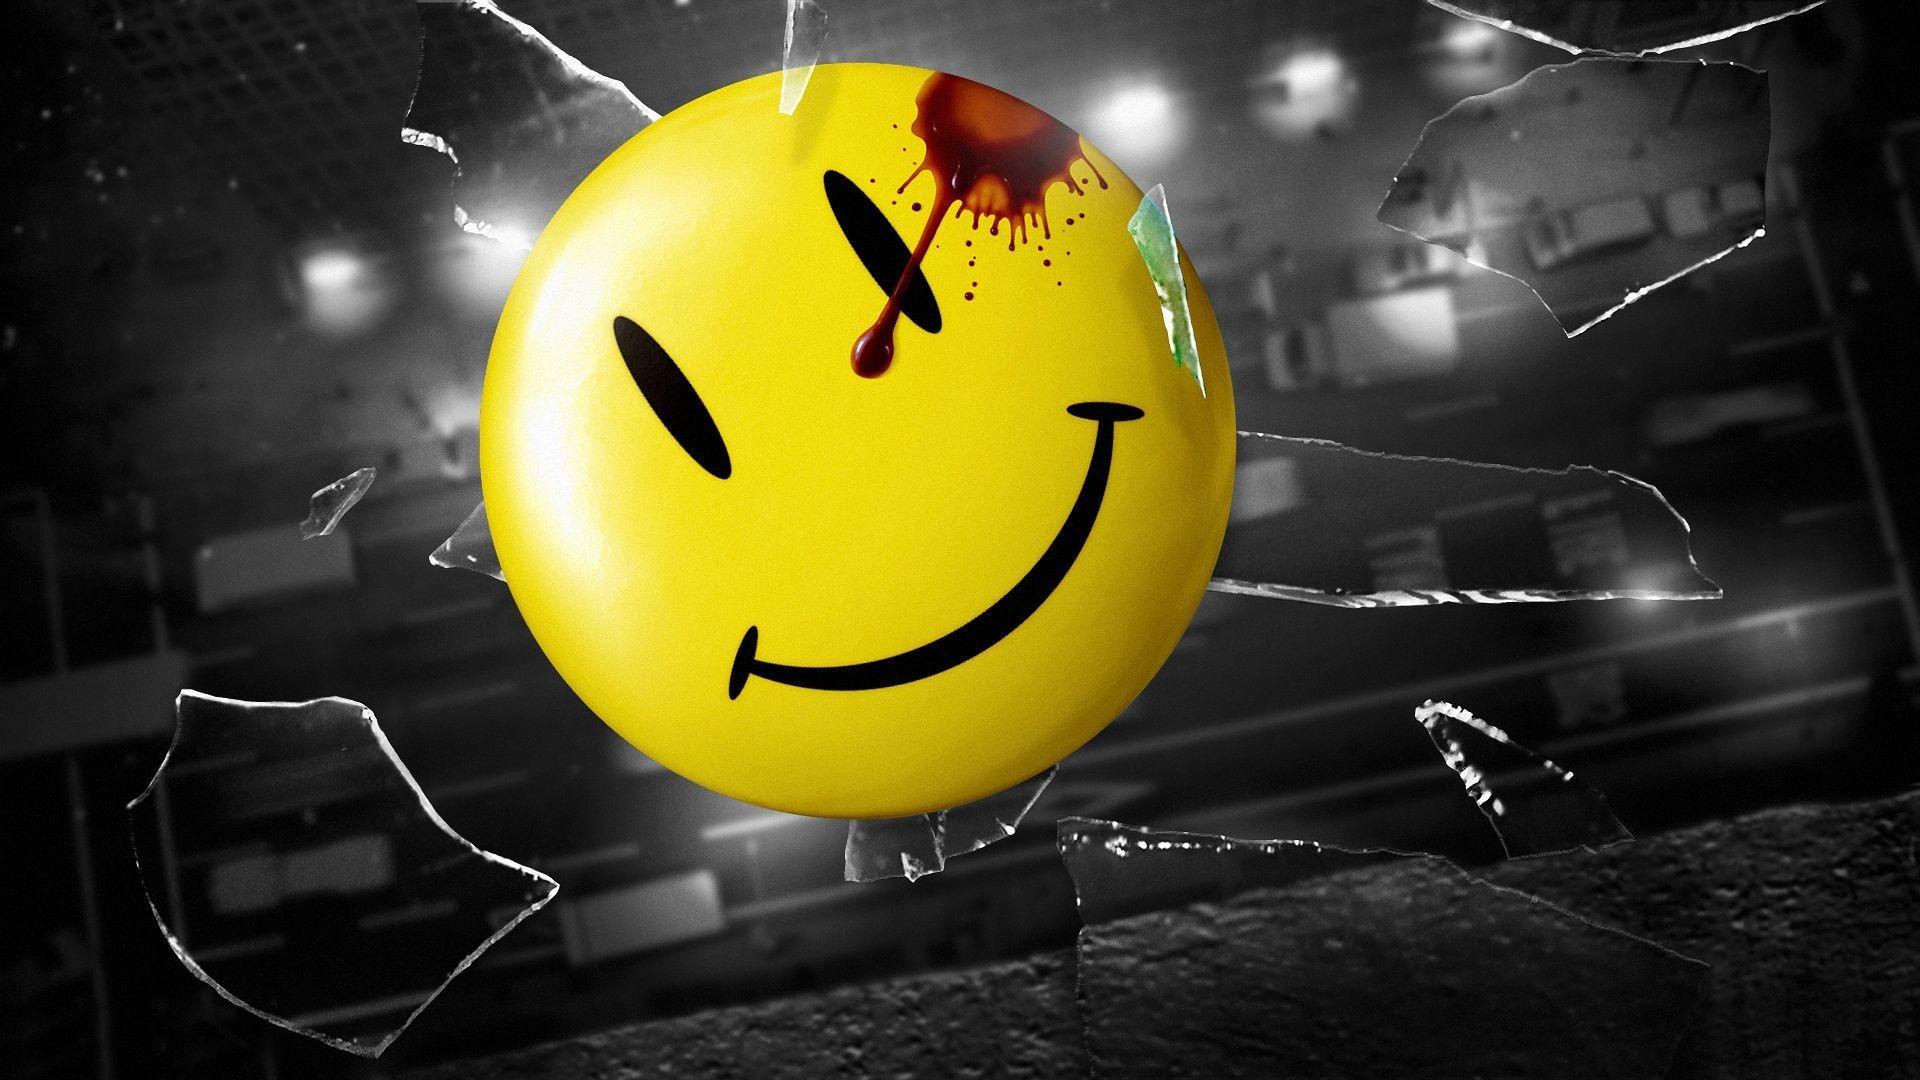 Top 20 Smiley Face Wallpaper: Smiley Face Backgrounds ·①